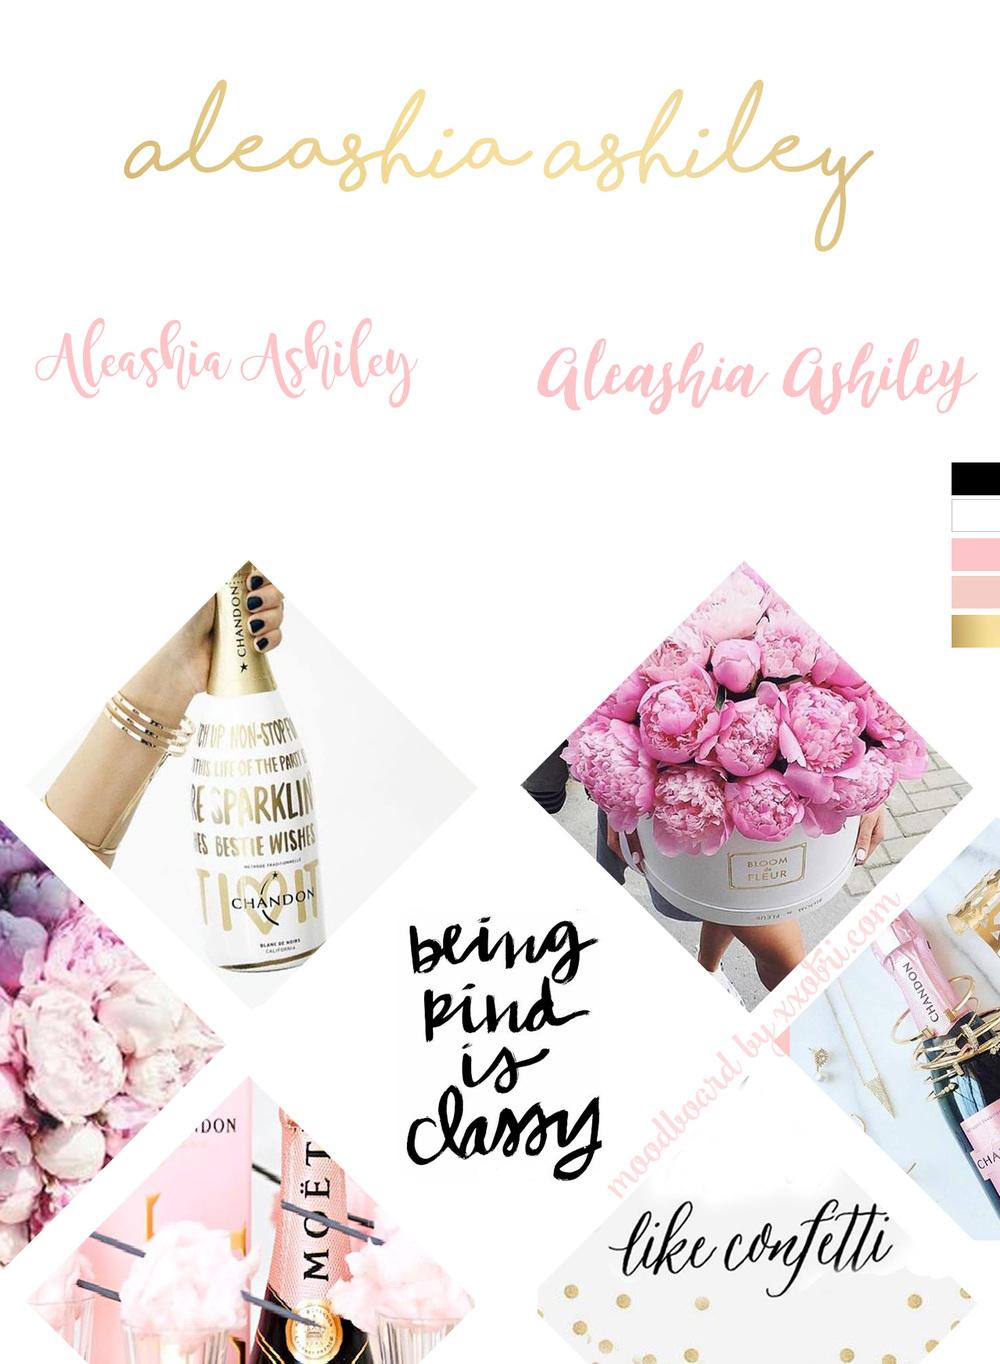 ALEASHIA ASHILEY // HEALTH & FITNESS LIFESTYLE BLOGGER // BRANDING MOODBOARD BY XXOBRI.COM